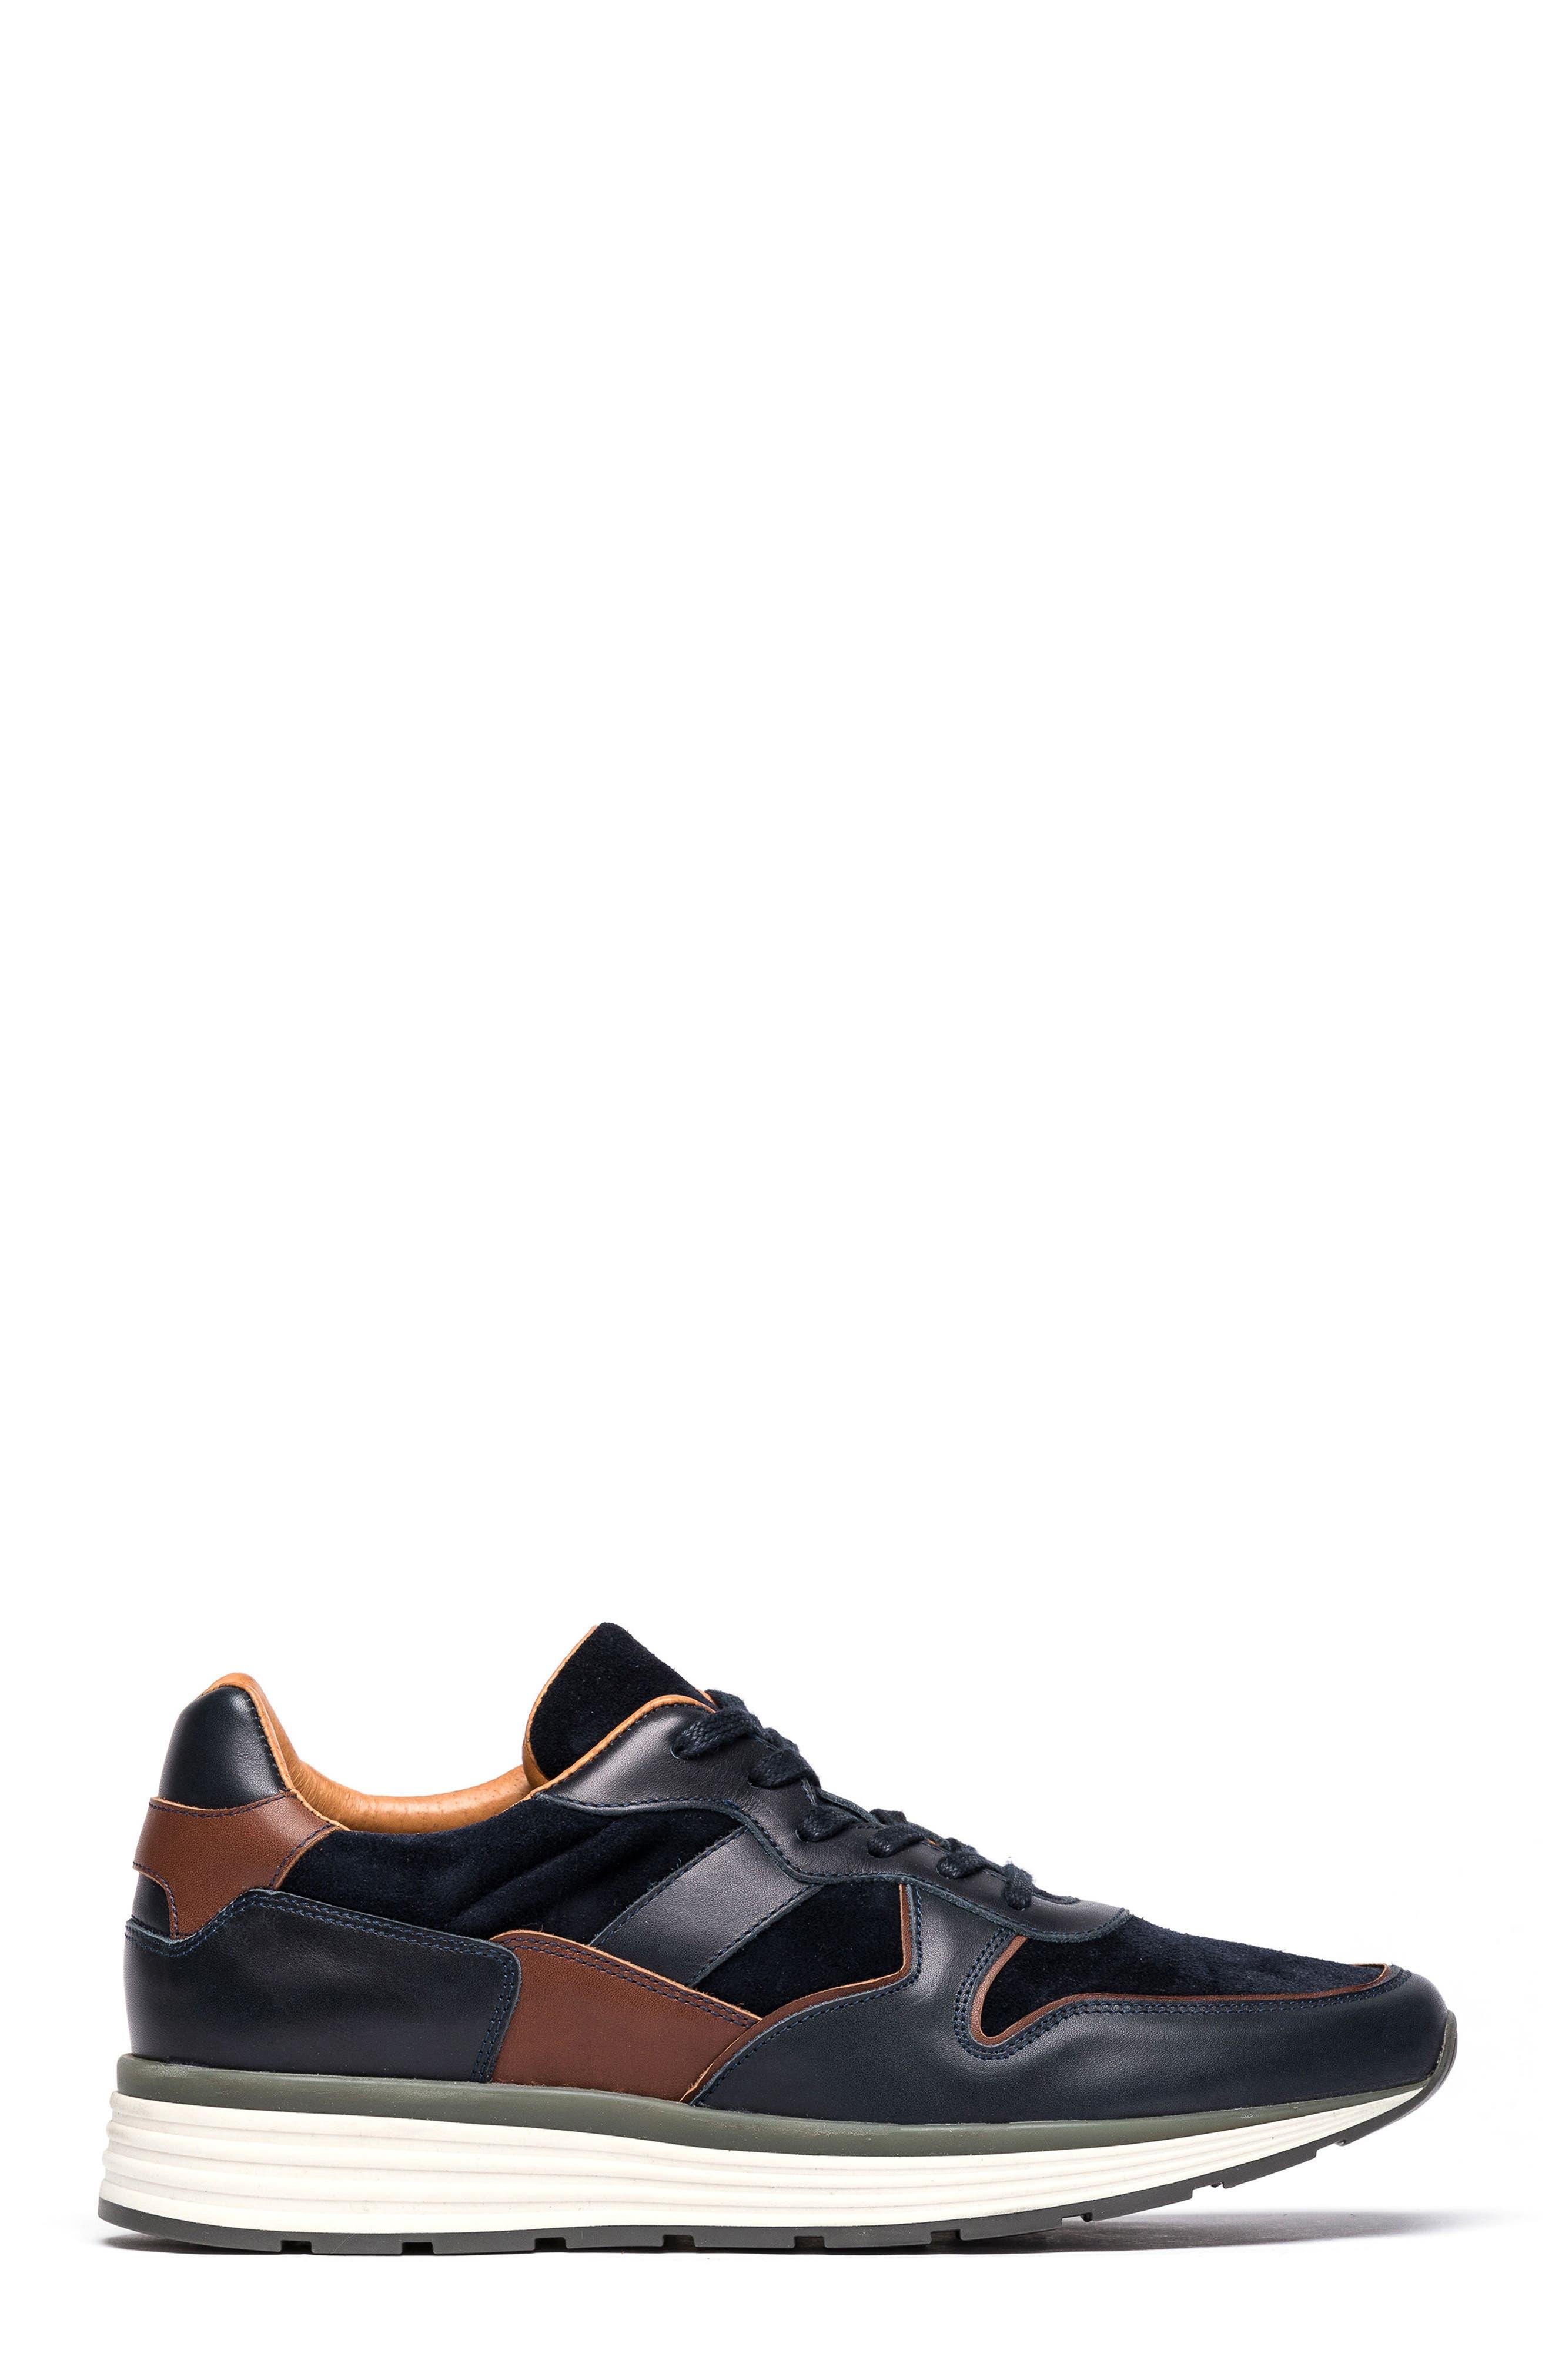 Hickory Sneaker,                             Alternate thumbnail 6, color,